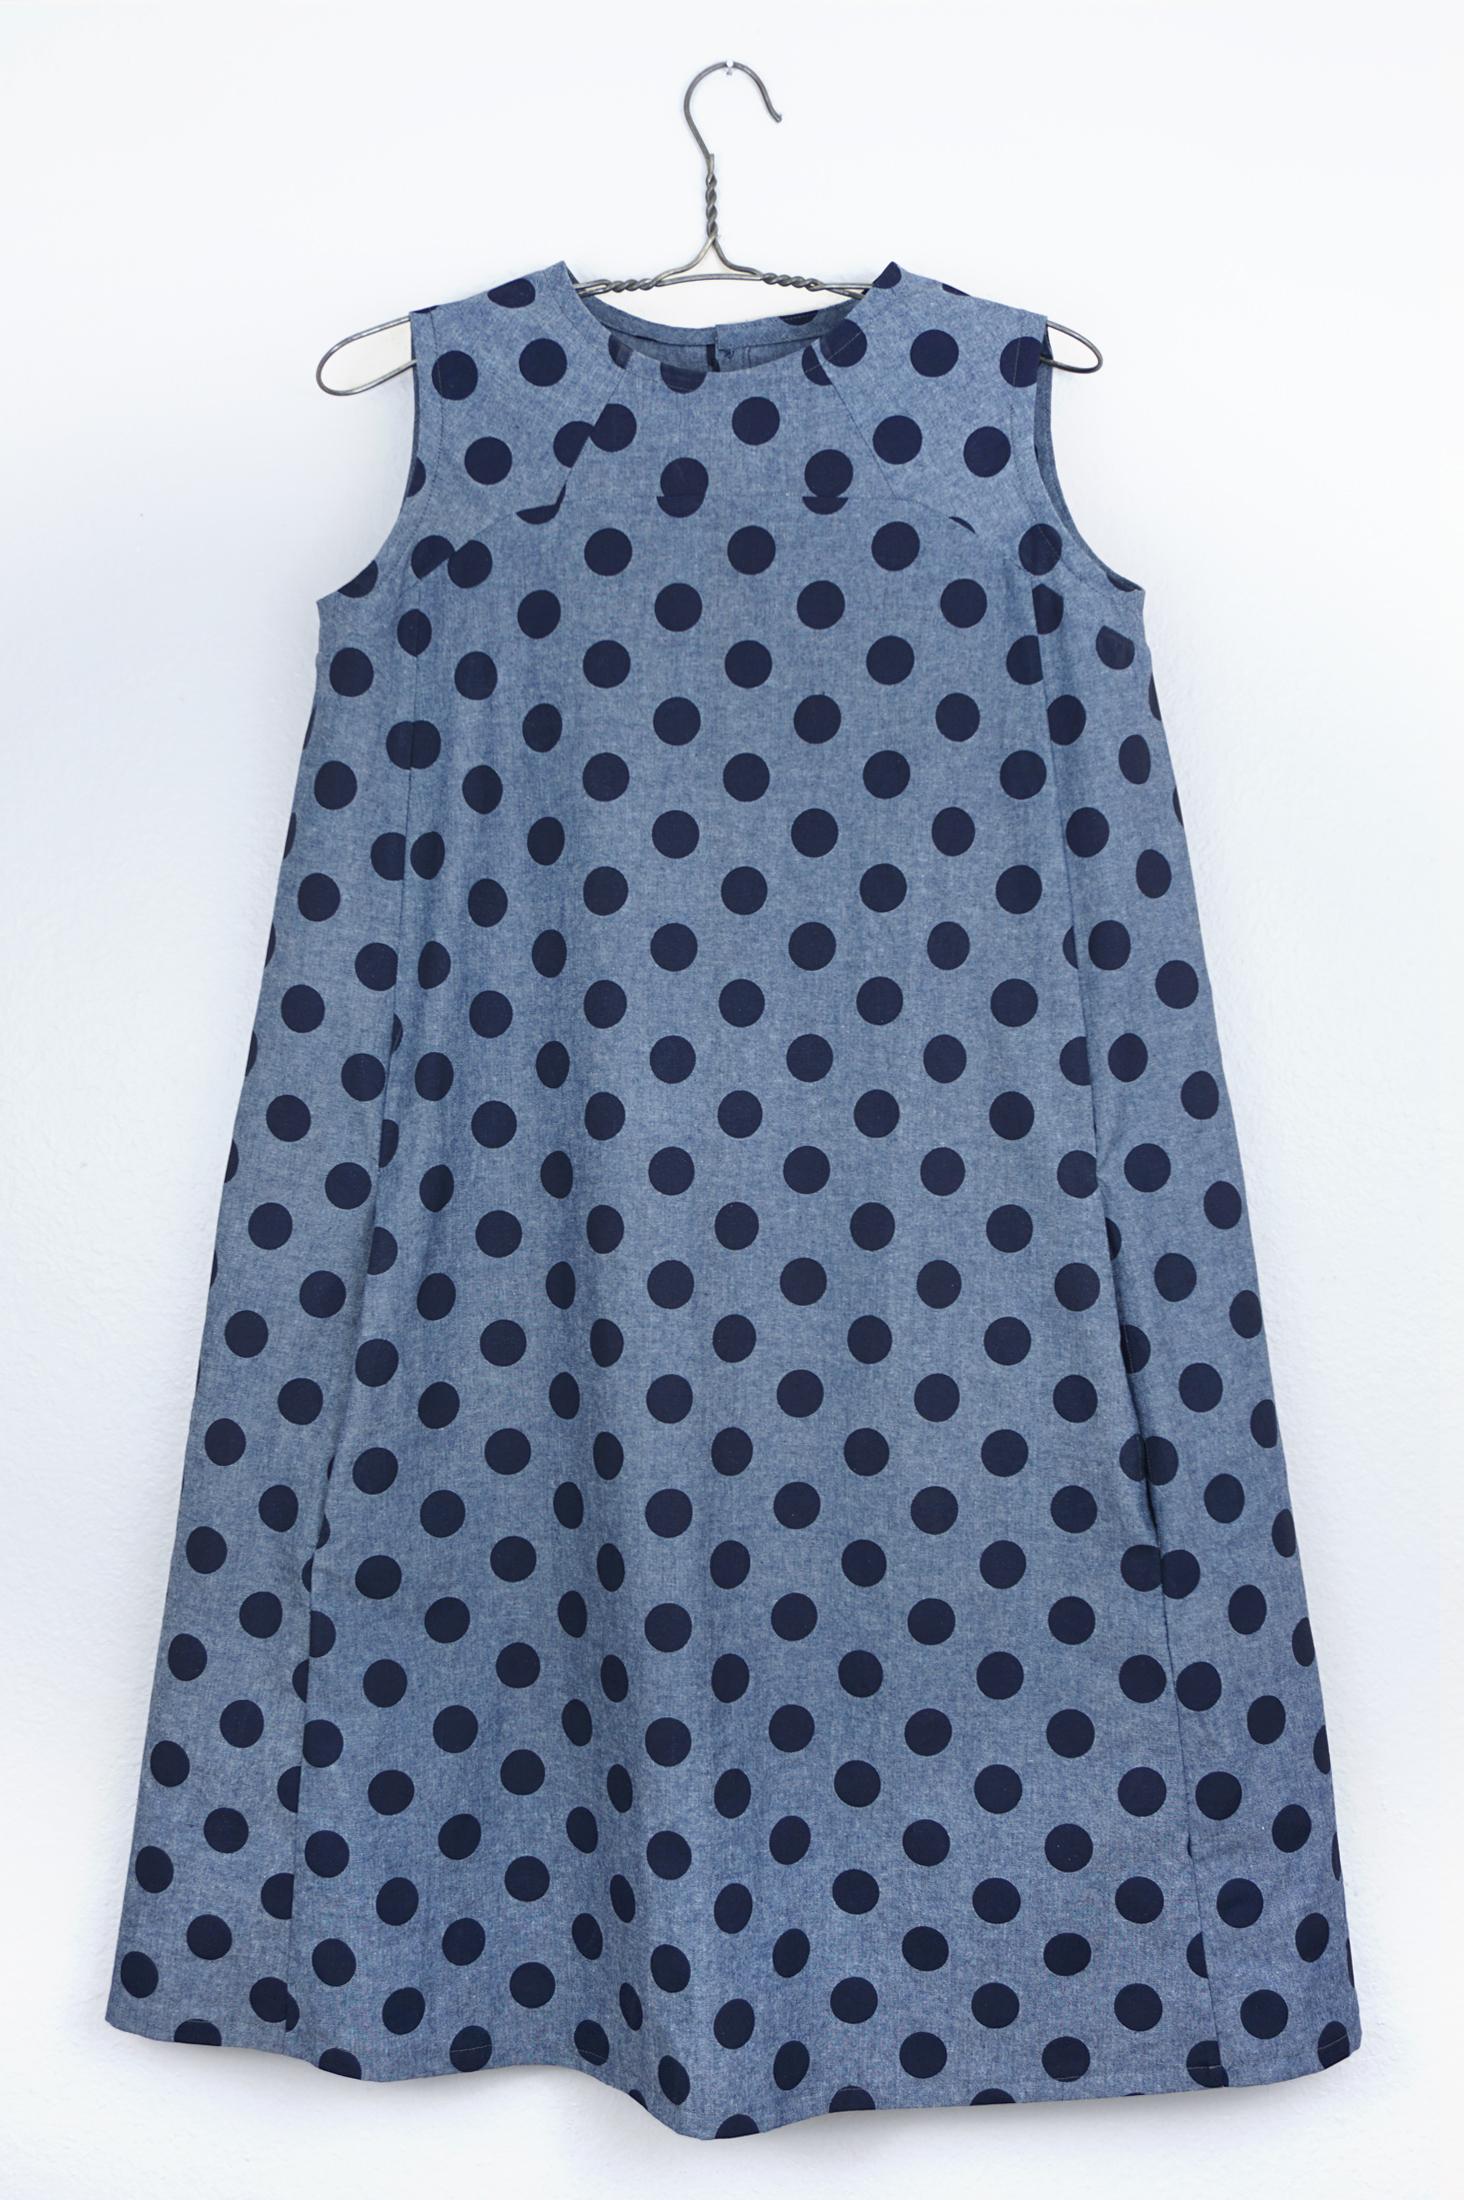 DIY Polka Dot Rushcutter Dress | Sew DIY